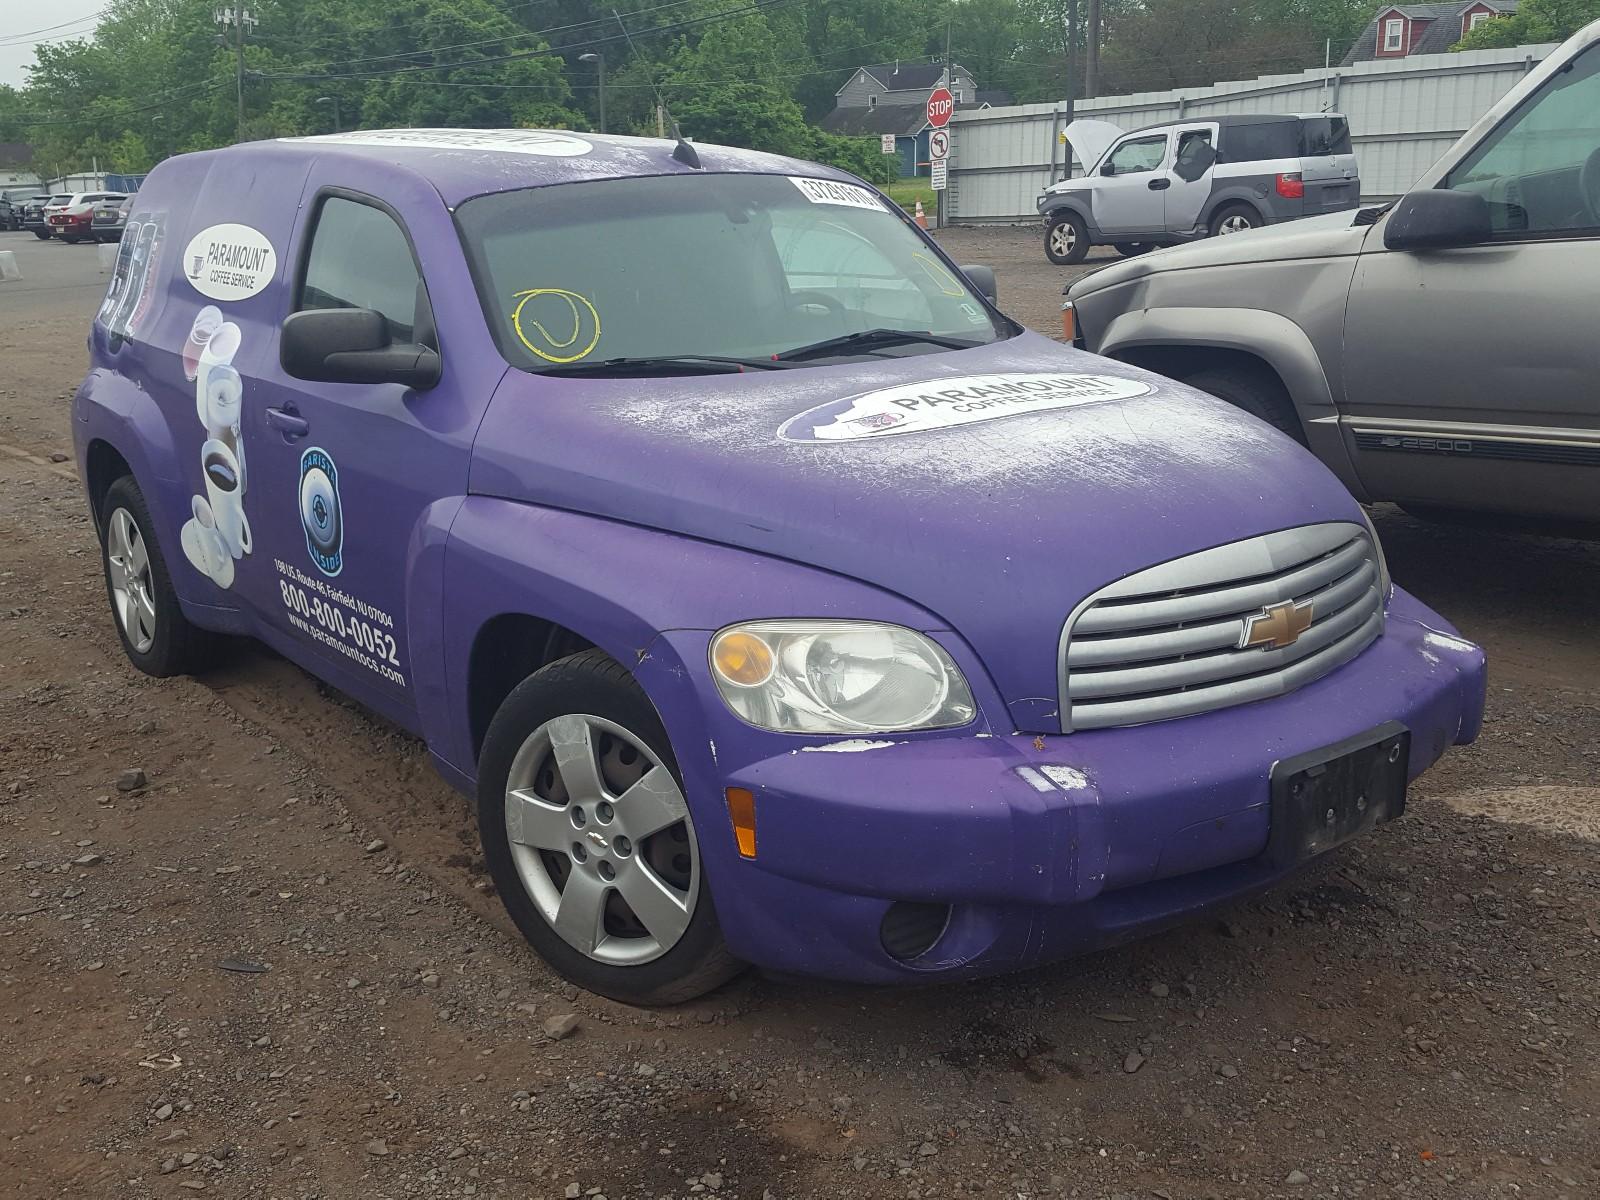 2011 Chevrolet Hhr Panel For Sale At Copart Hillsborough Nj Lot